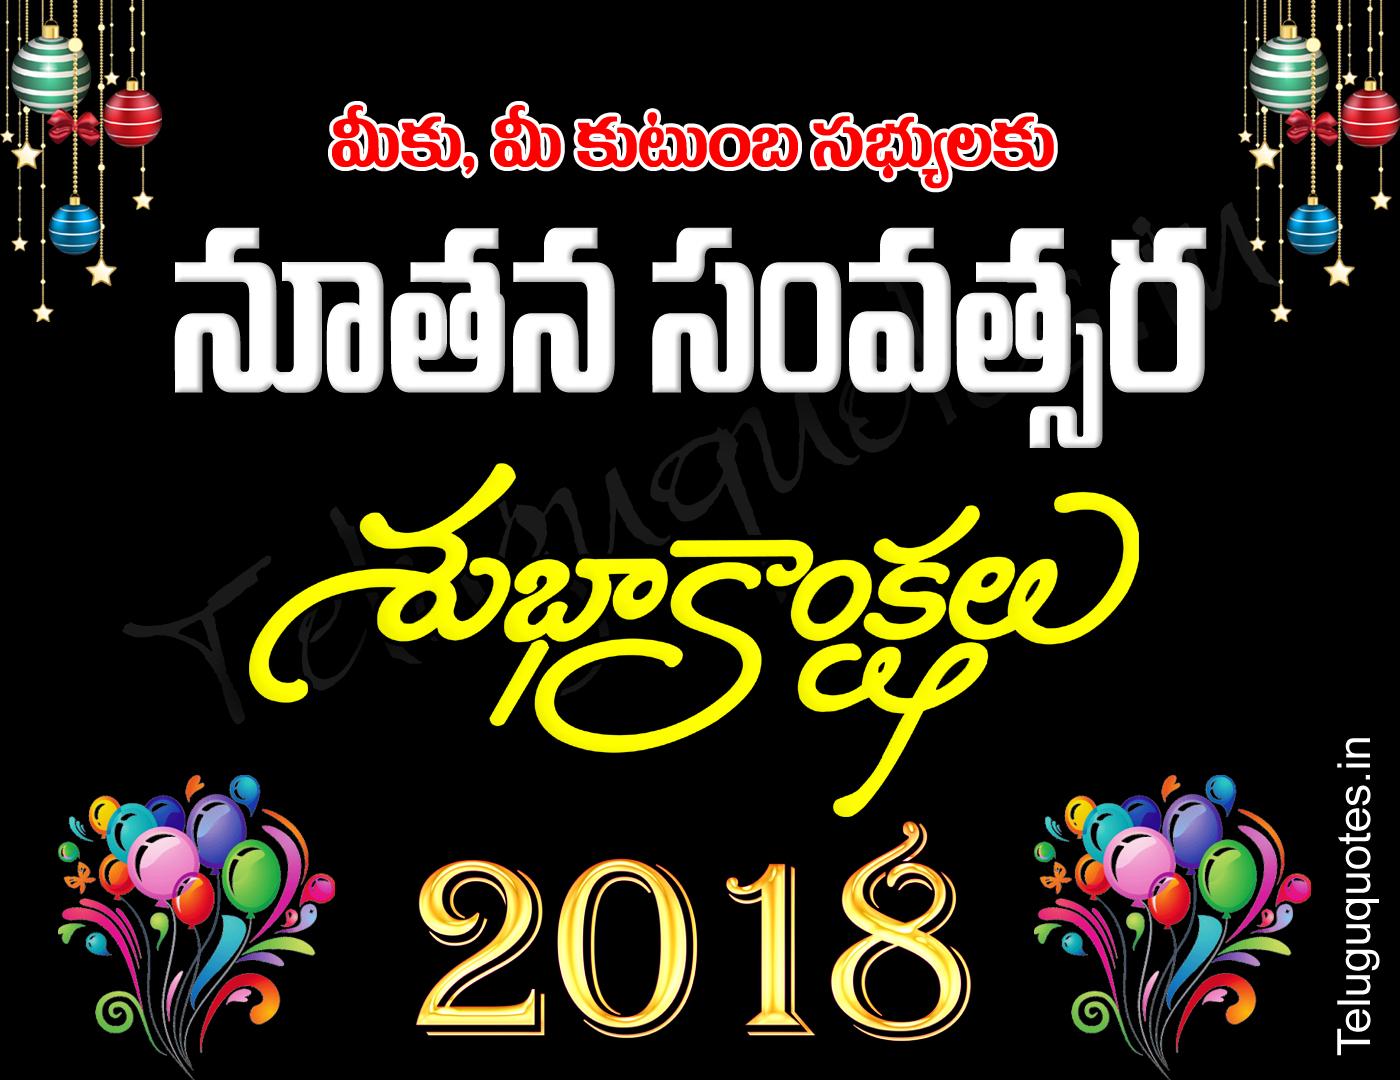 Happy New Year Images In Telugu Telugu Quotes